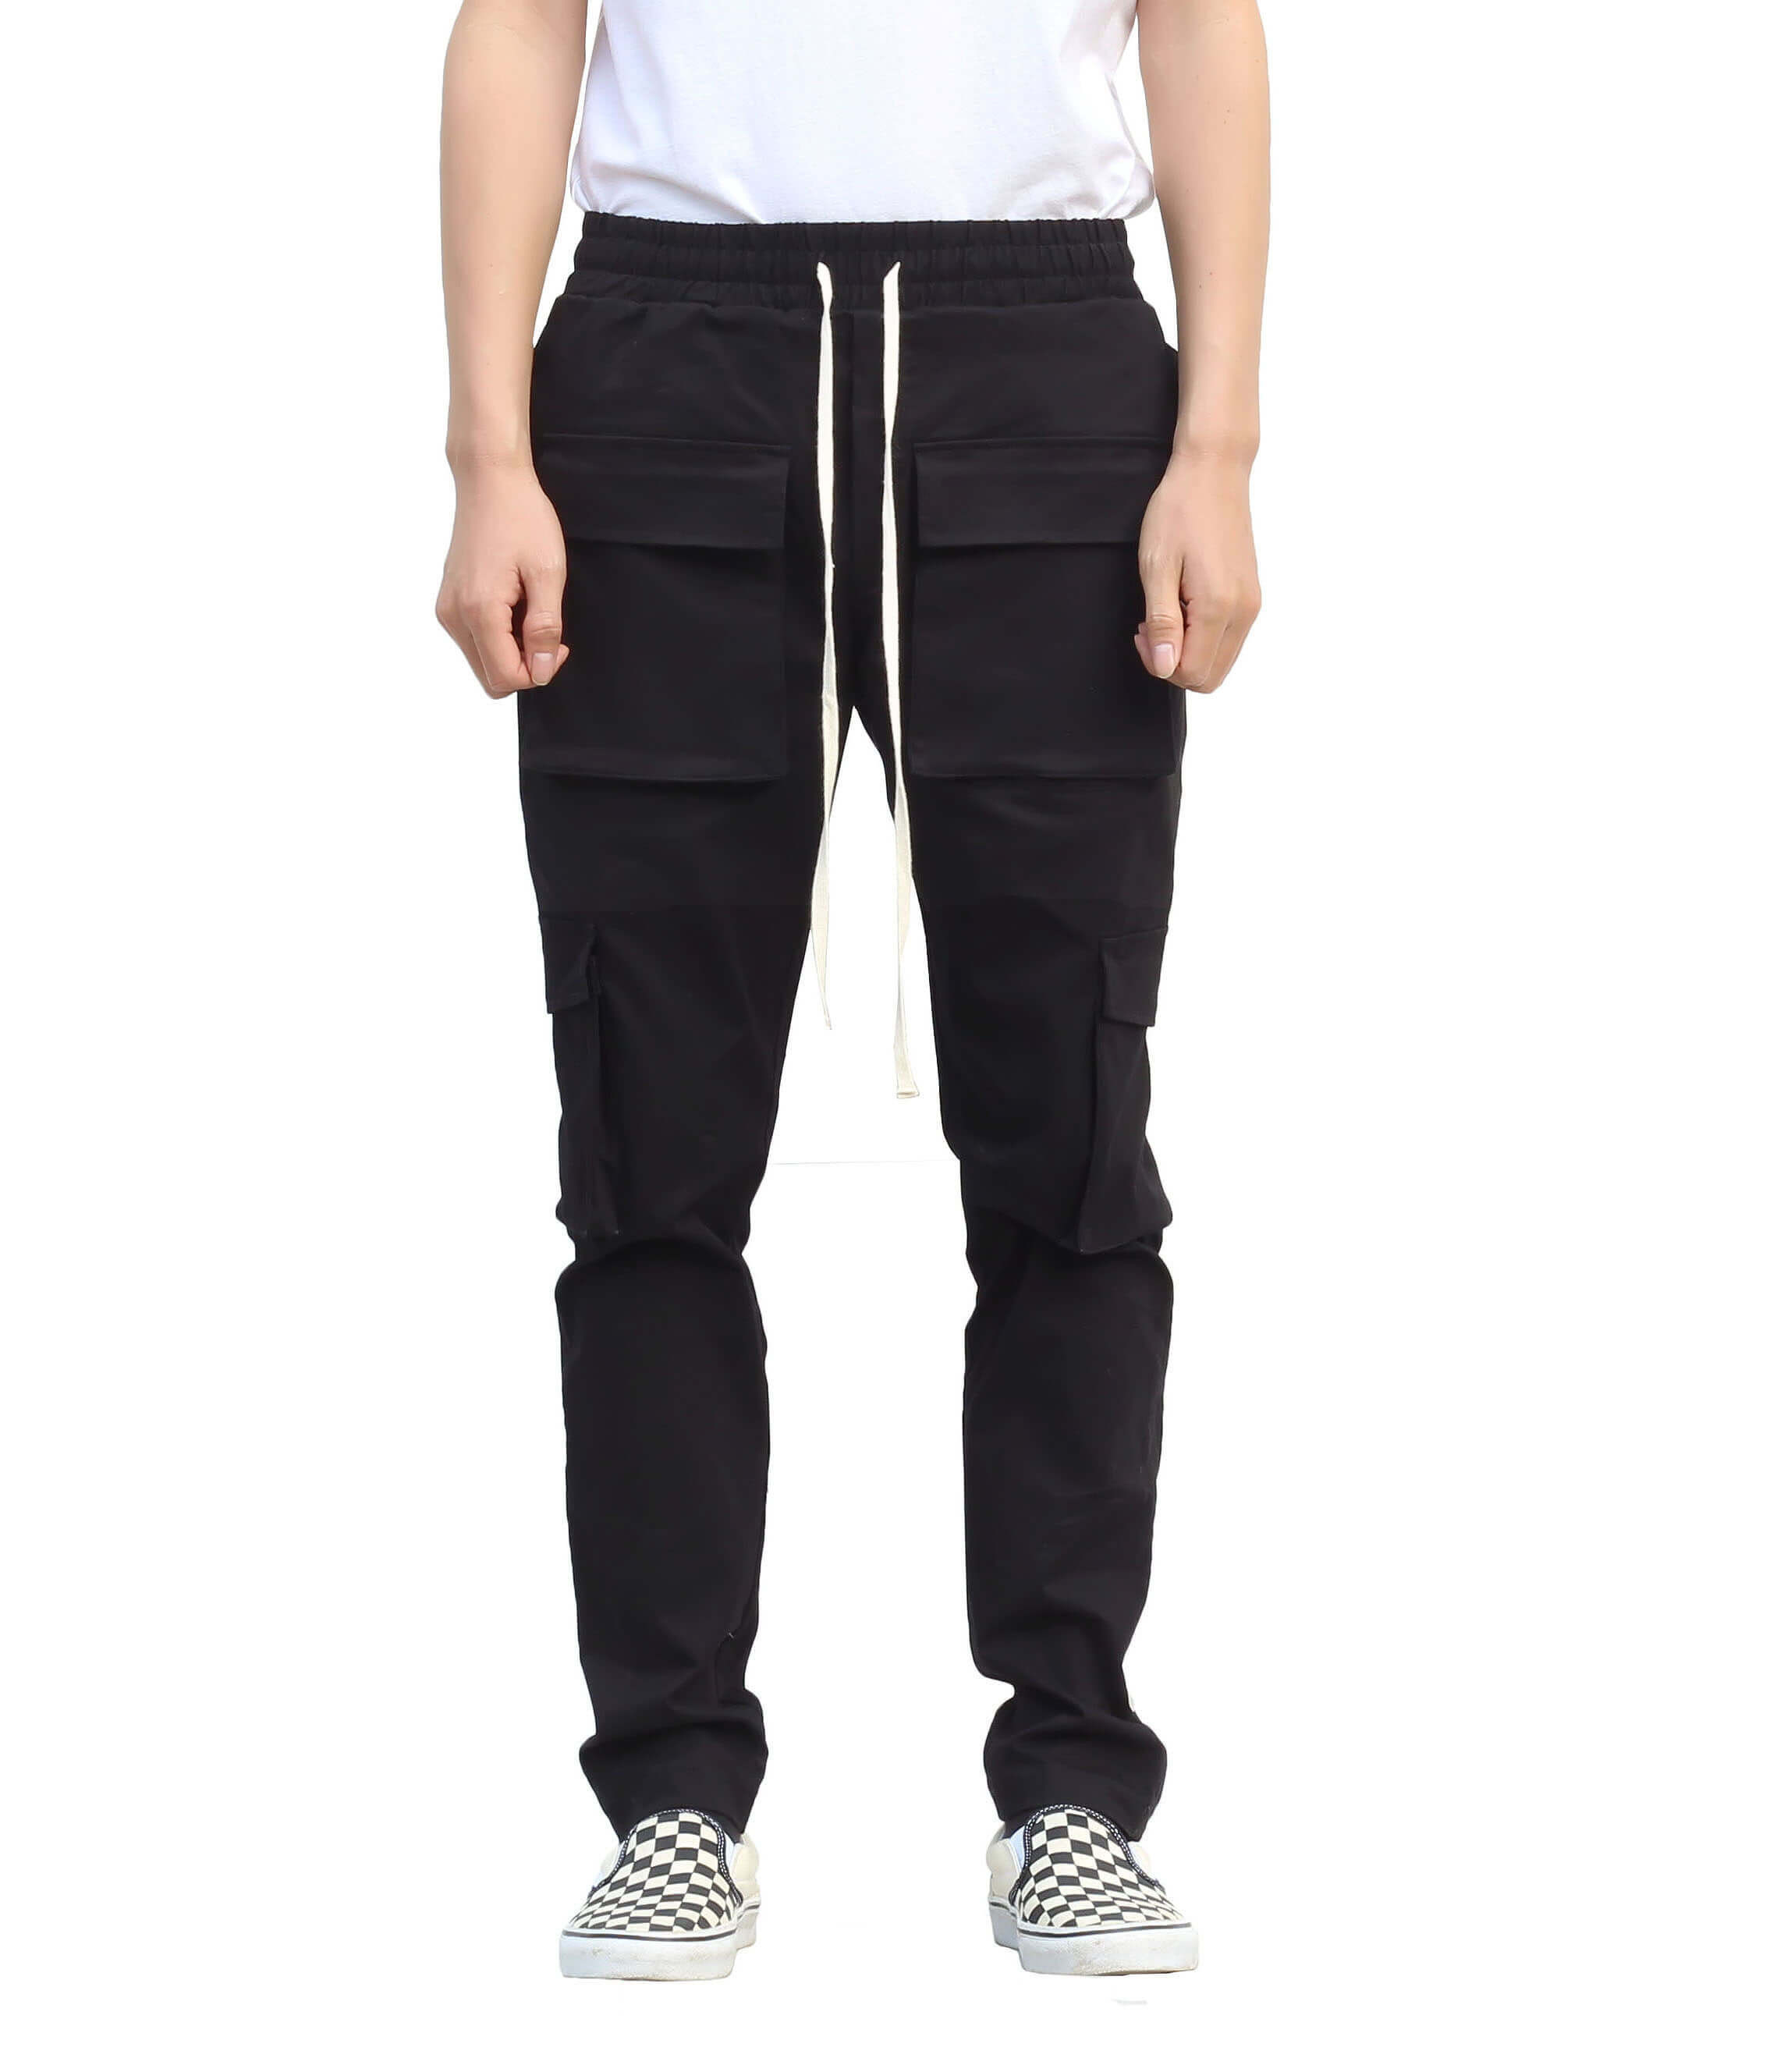 Cargo Pants V2 - Black